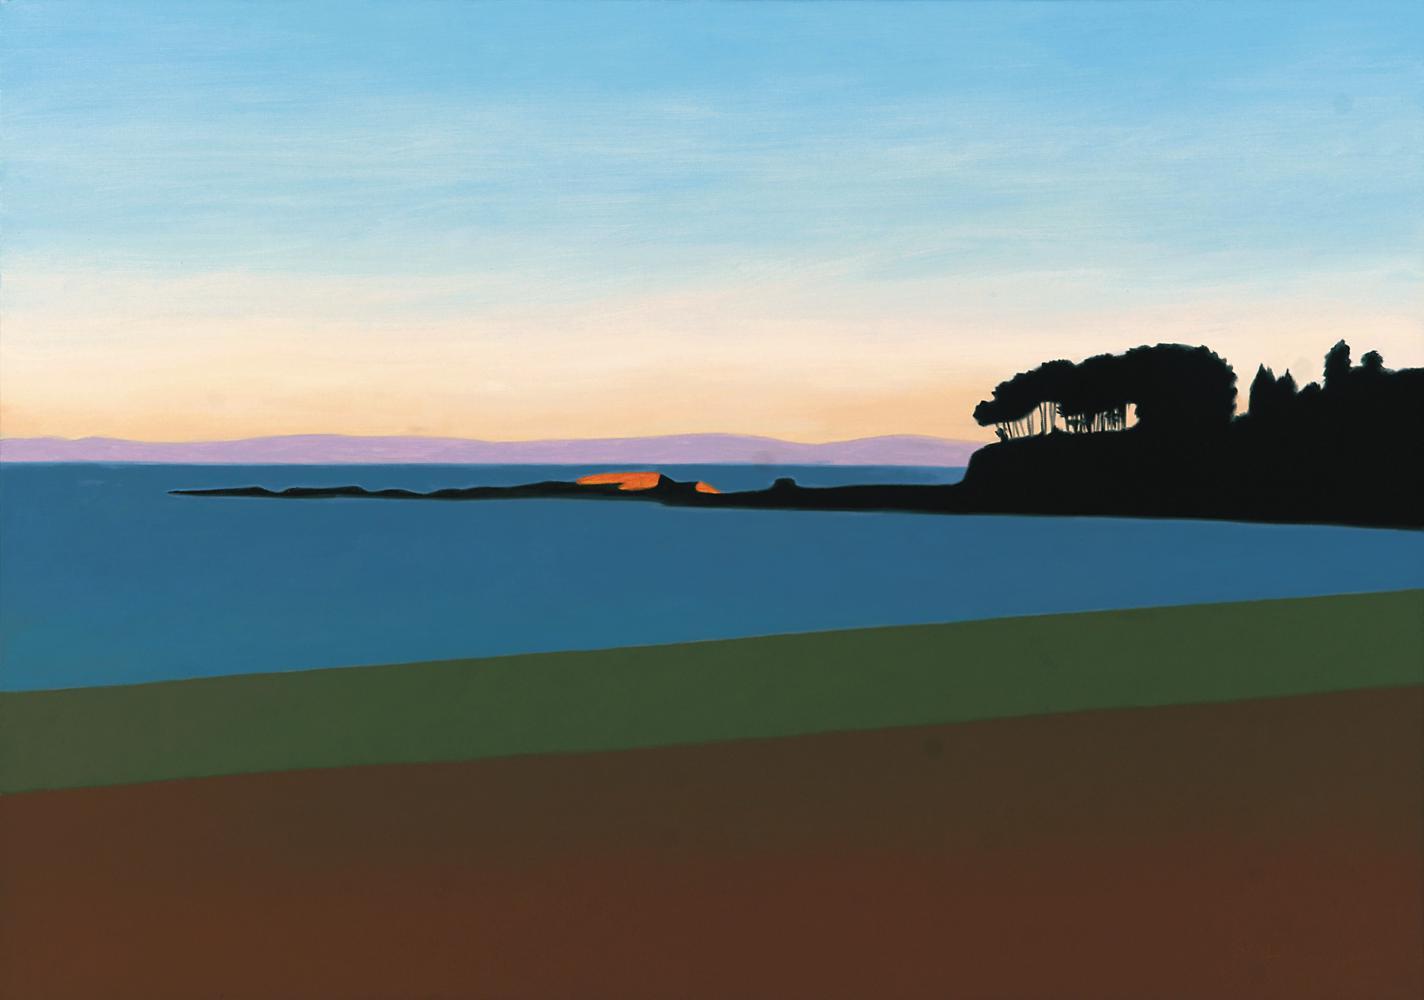 Playa de Santa Cristina, 65 x 92 cm, óleo lienzo, 2003.